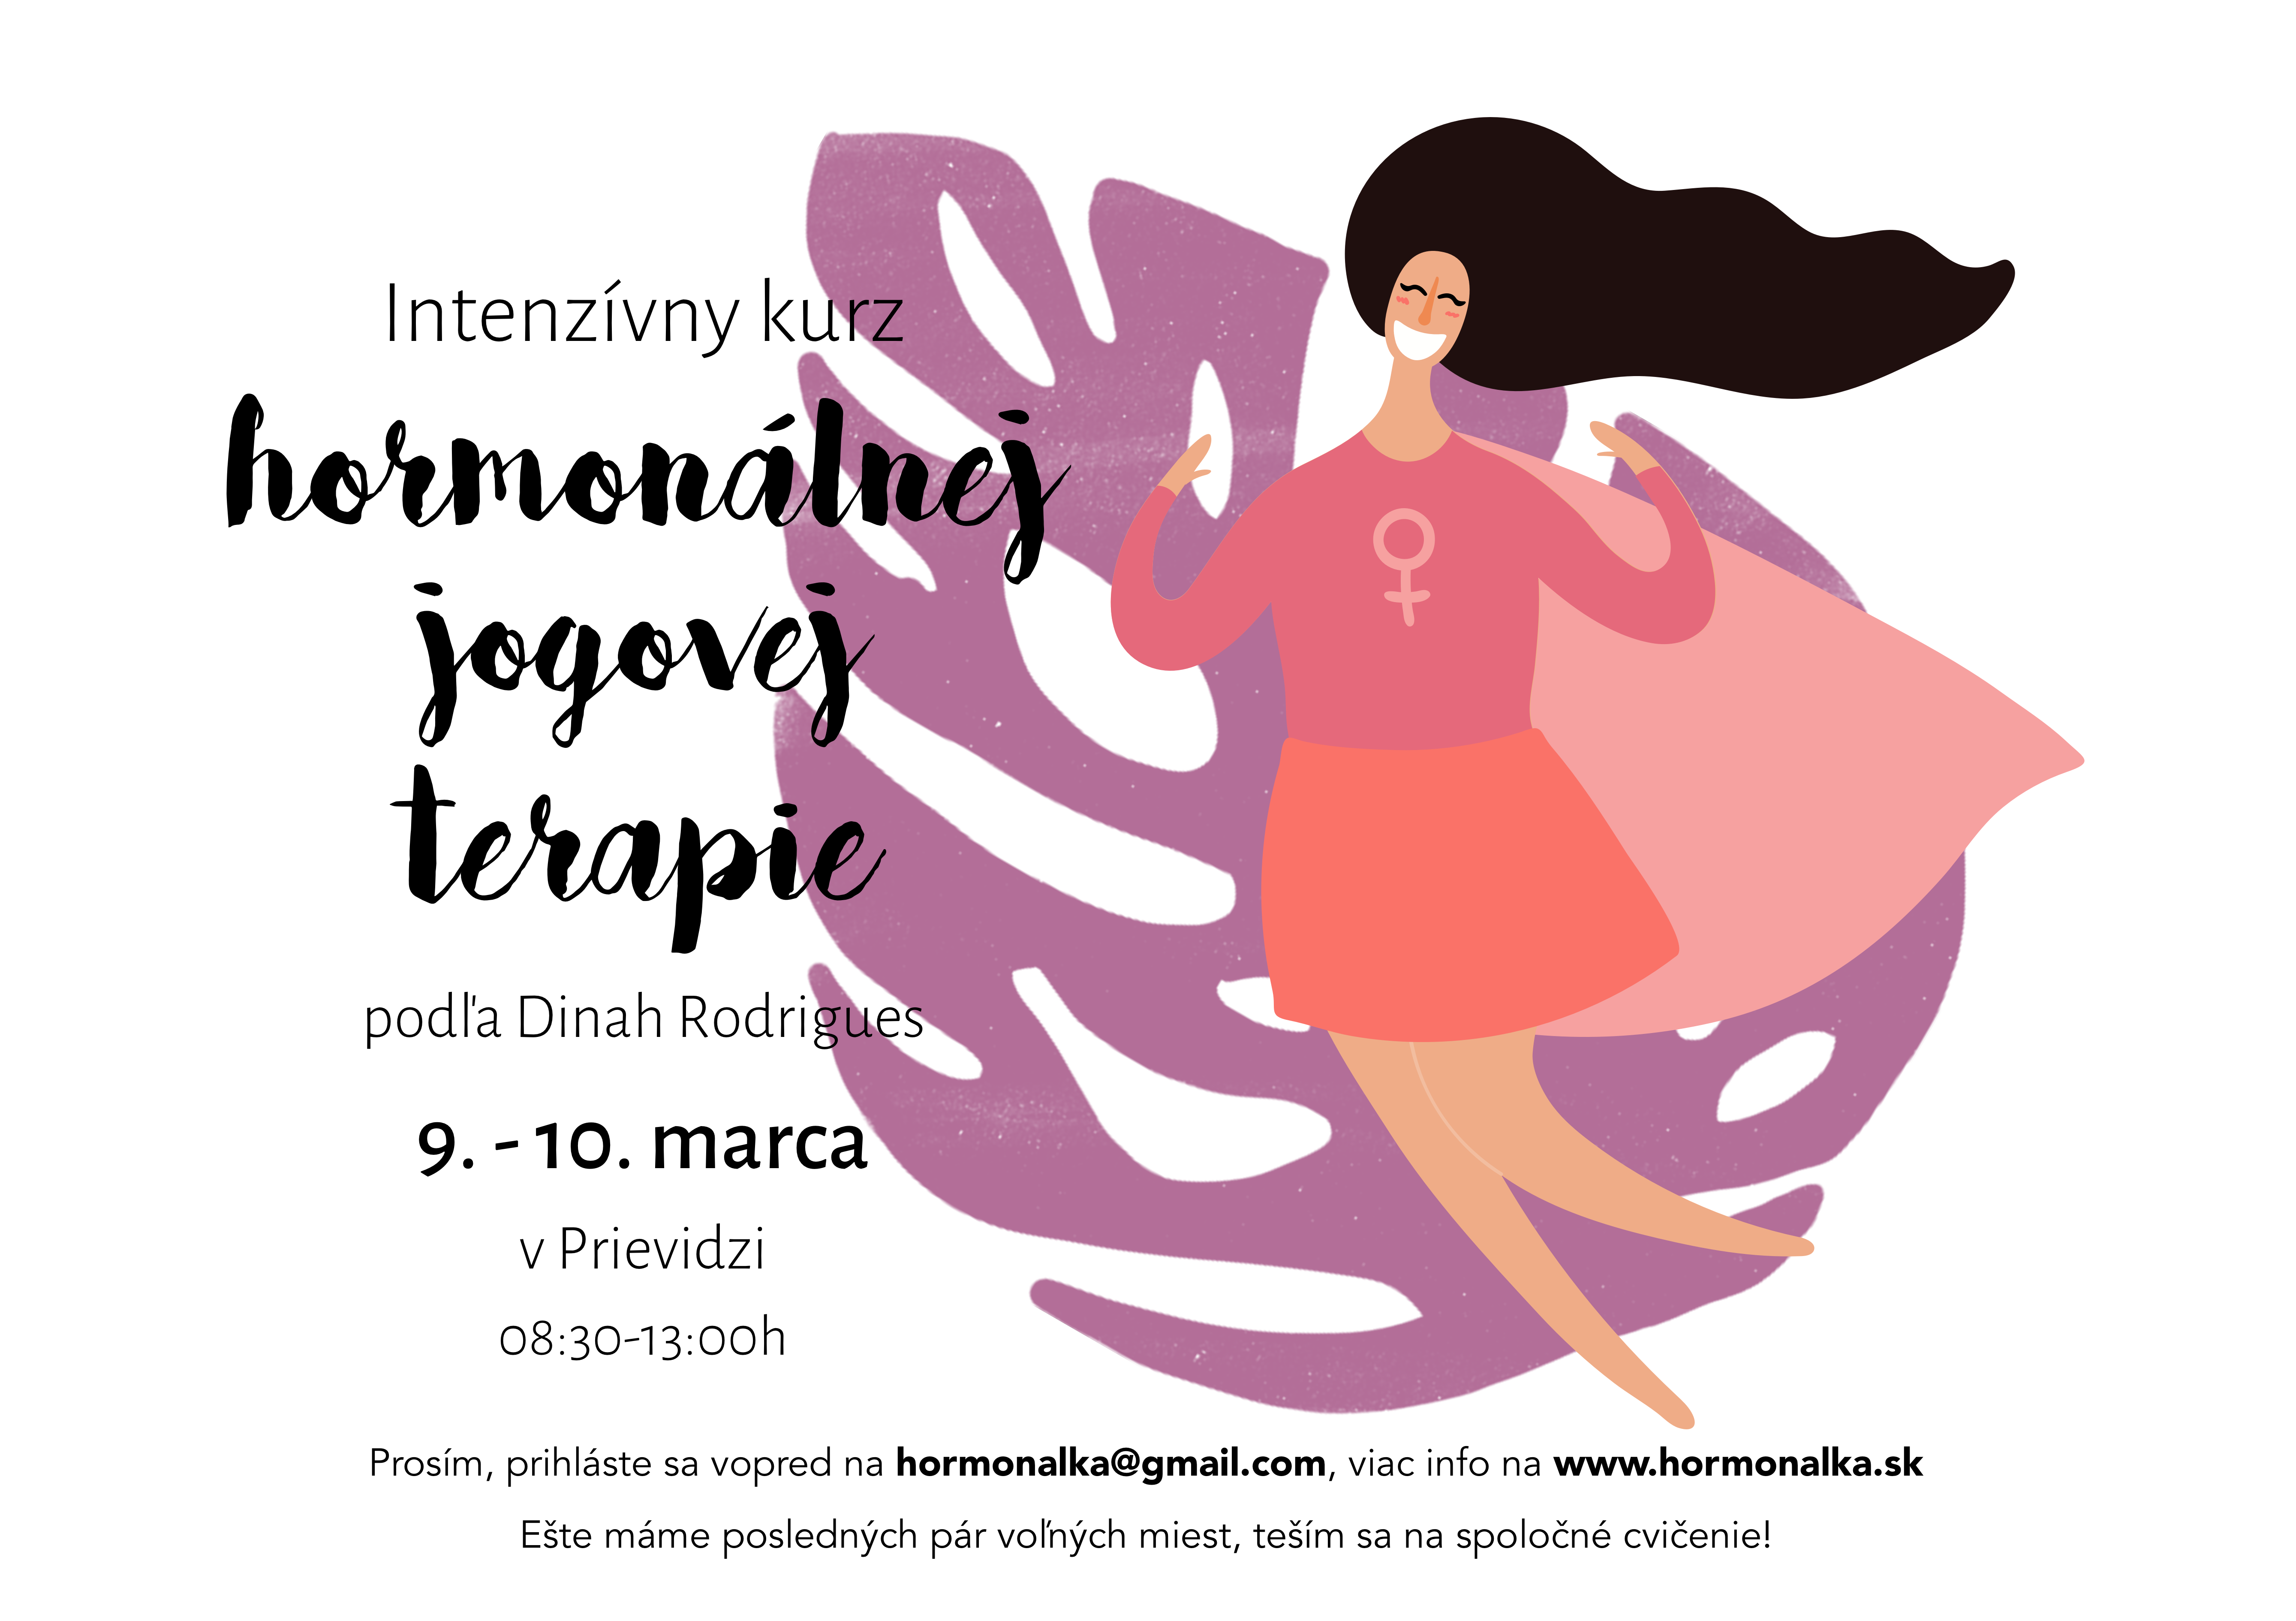 hormonalna-jogova-terapia-intenzivny-kurz-jana-sramkova-prievidza